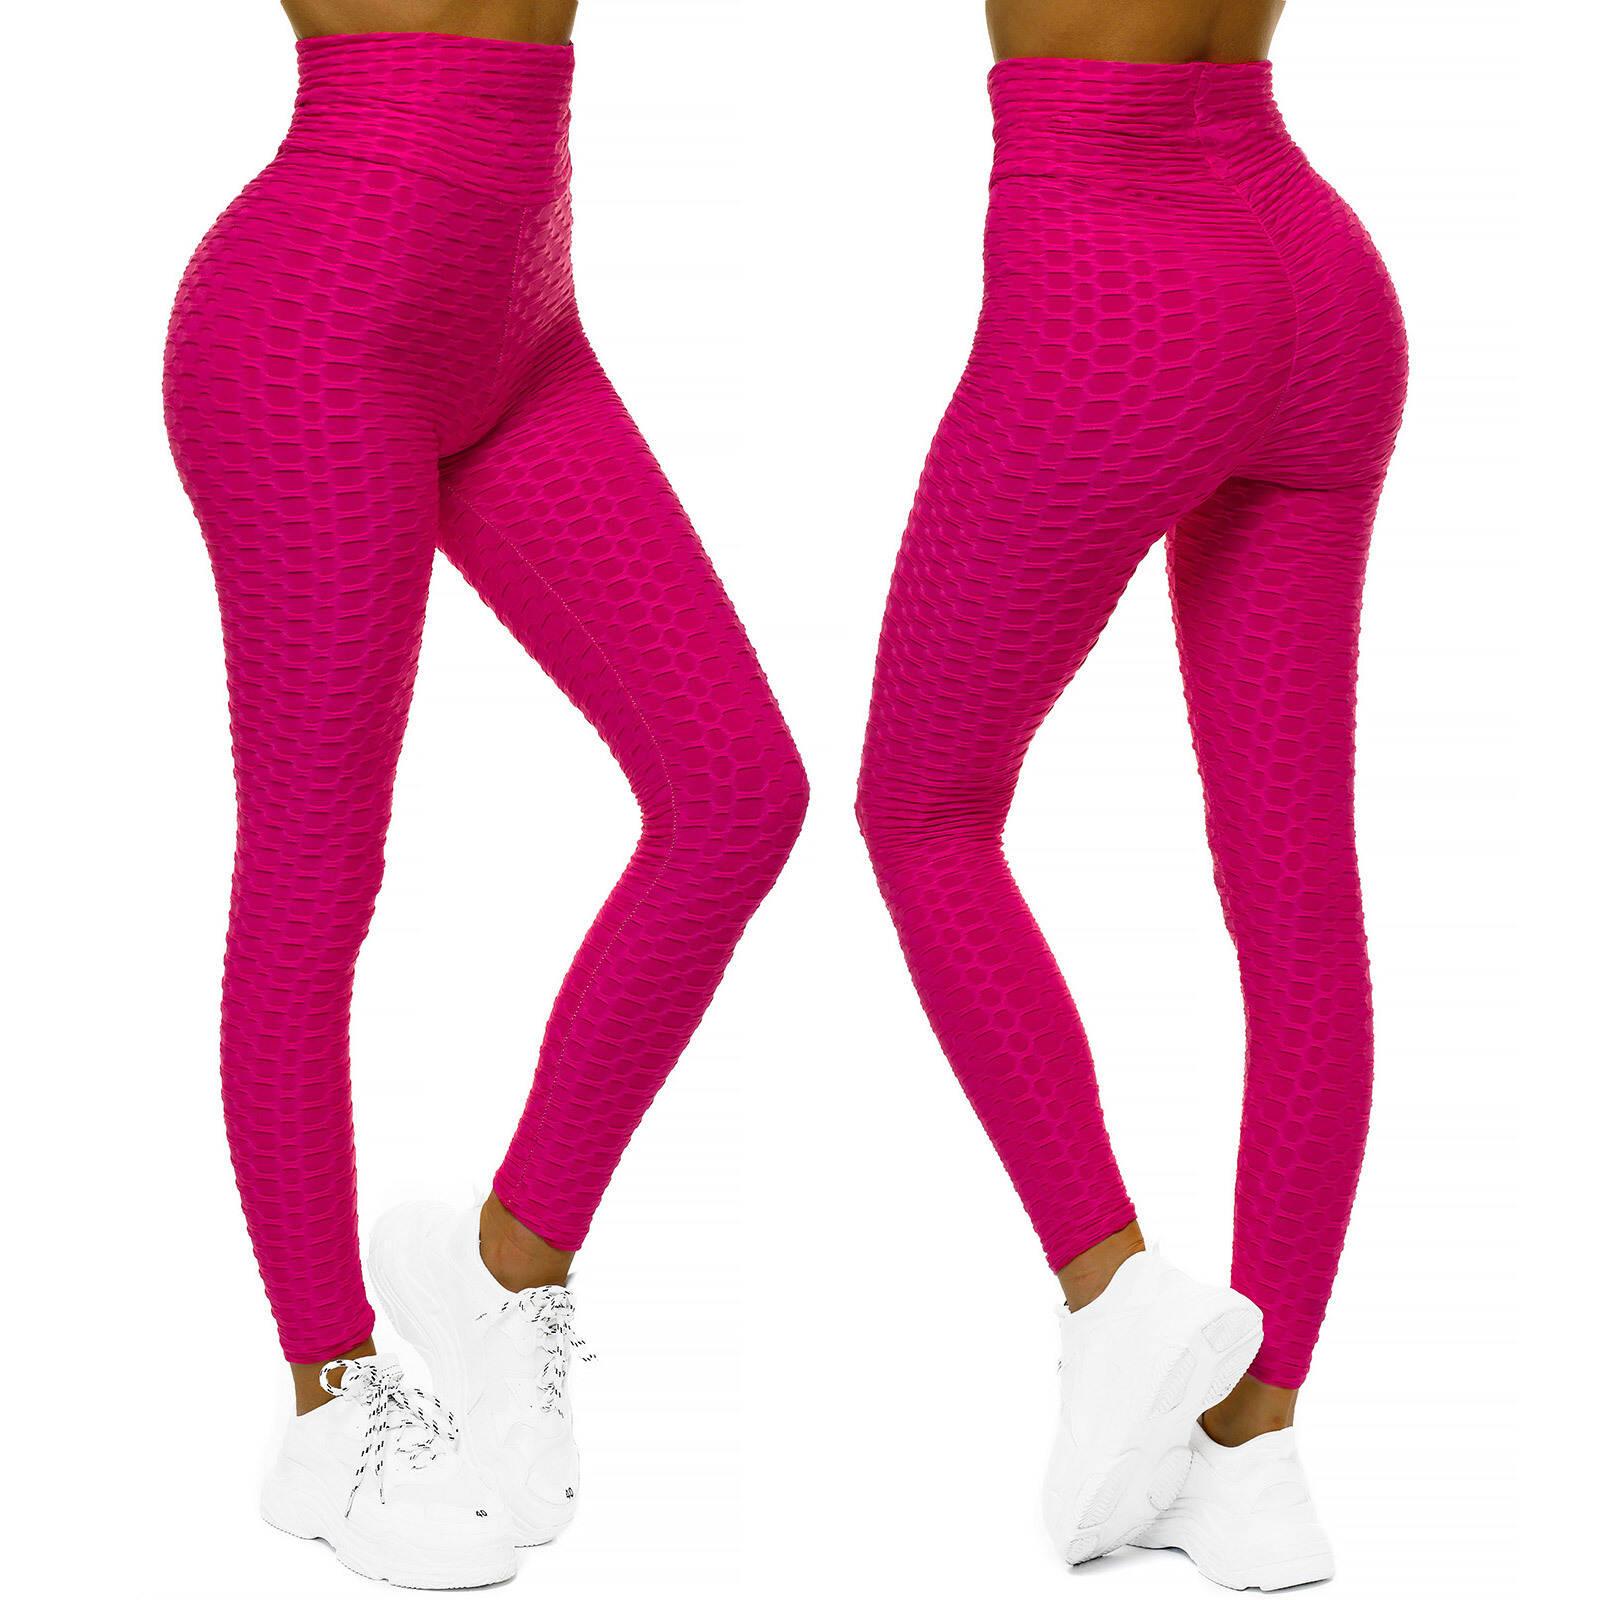 Indexbild 11 - Leggings Yoga Fitness Leggins Jogging Trainingshose Sporthose Hosen Damen OZONEE